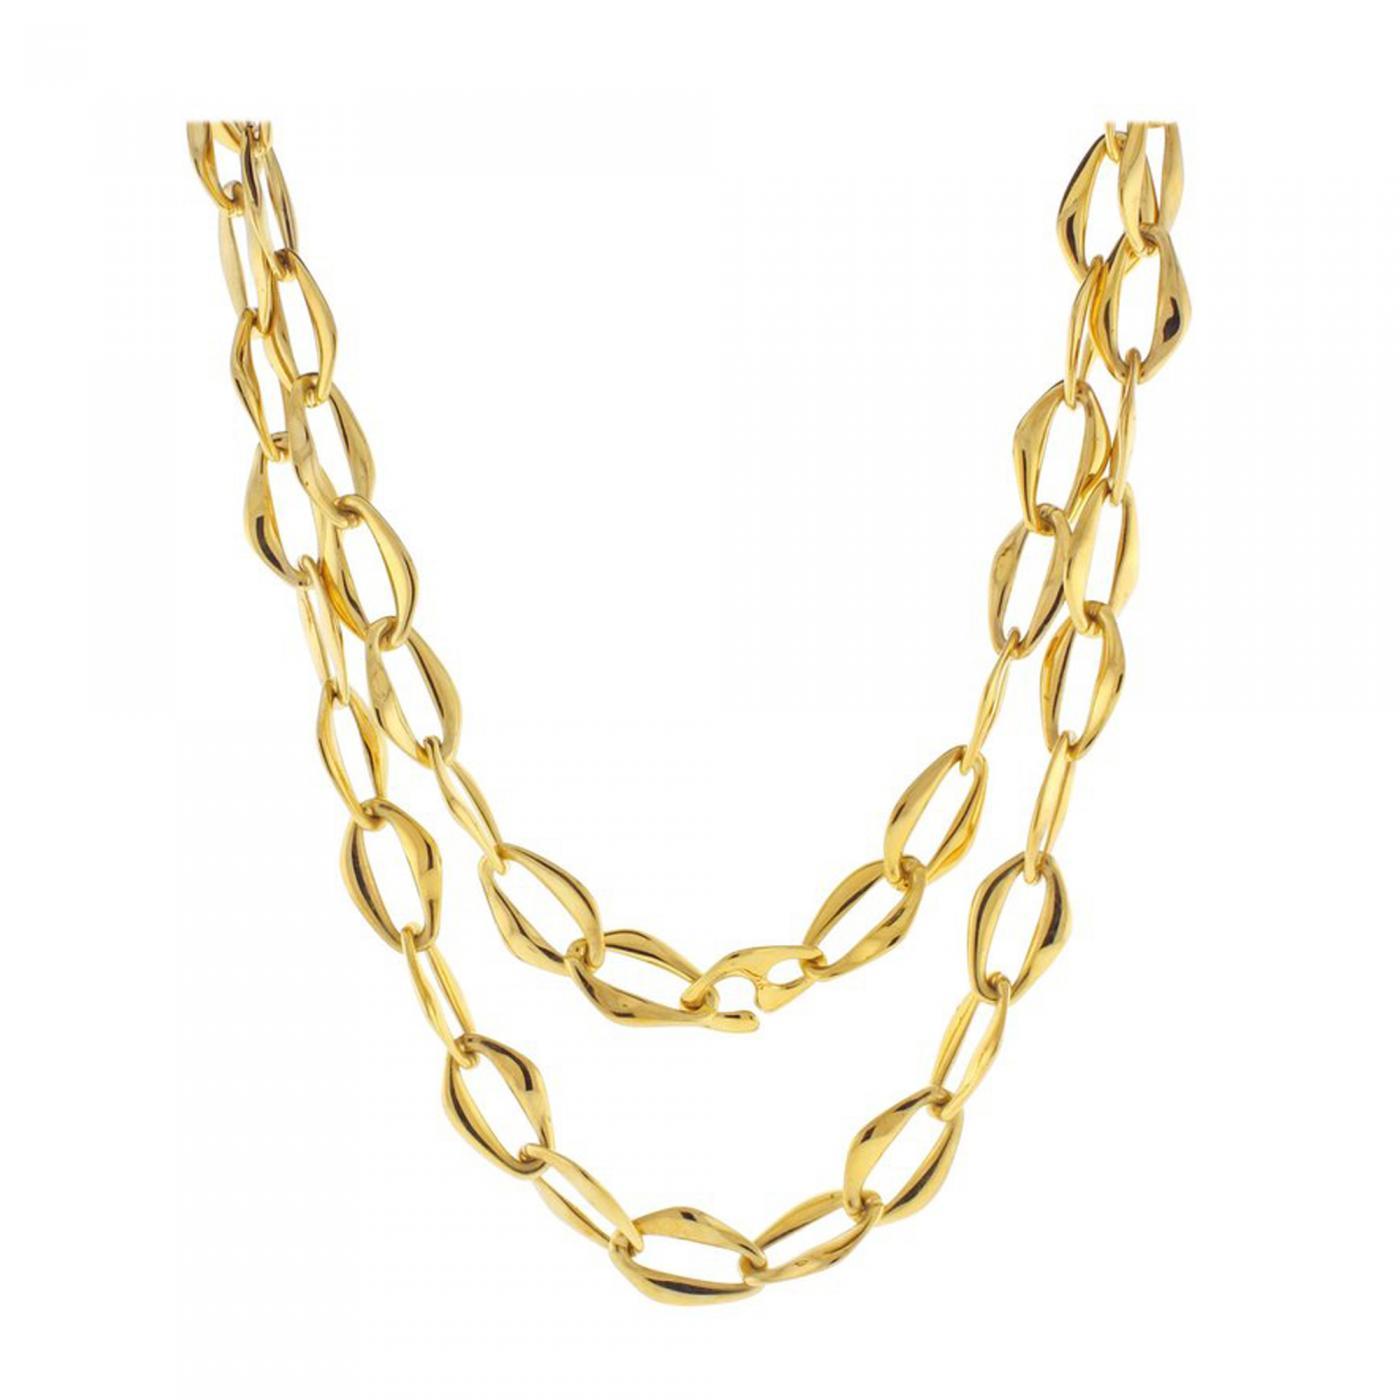 3da74e2a2 Elsa Peretti - Tiffany & Co. Elsa Peretti Aegean Toggle Necklace